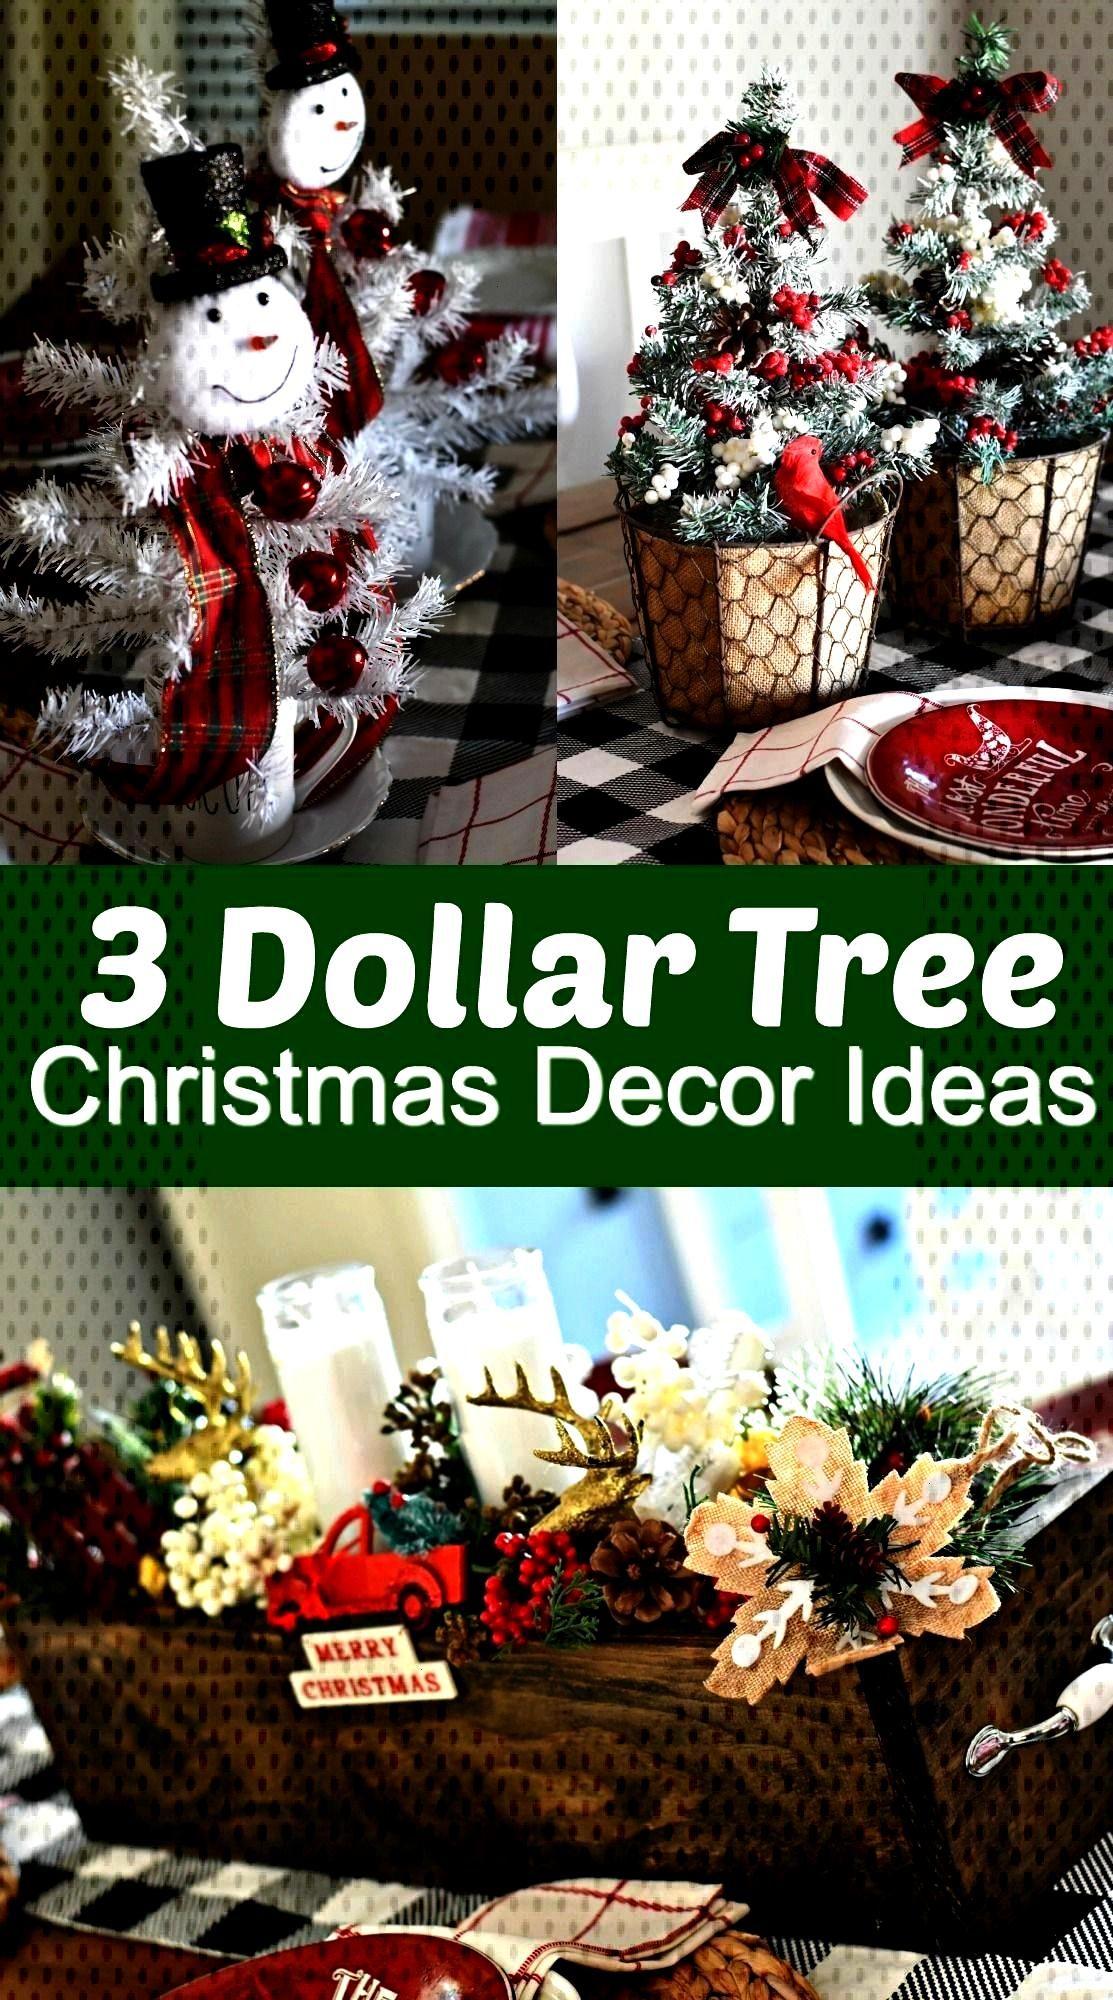 Simple & Fun DIY Dollar Tree Christmas Centerpieces3 Simple & Fun DIY Dollar Tree Christmas Centerp